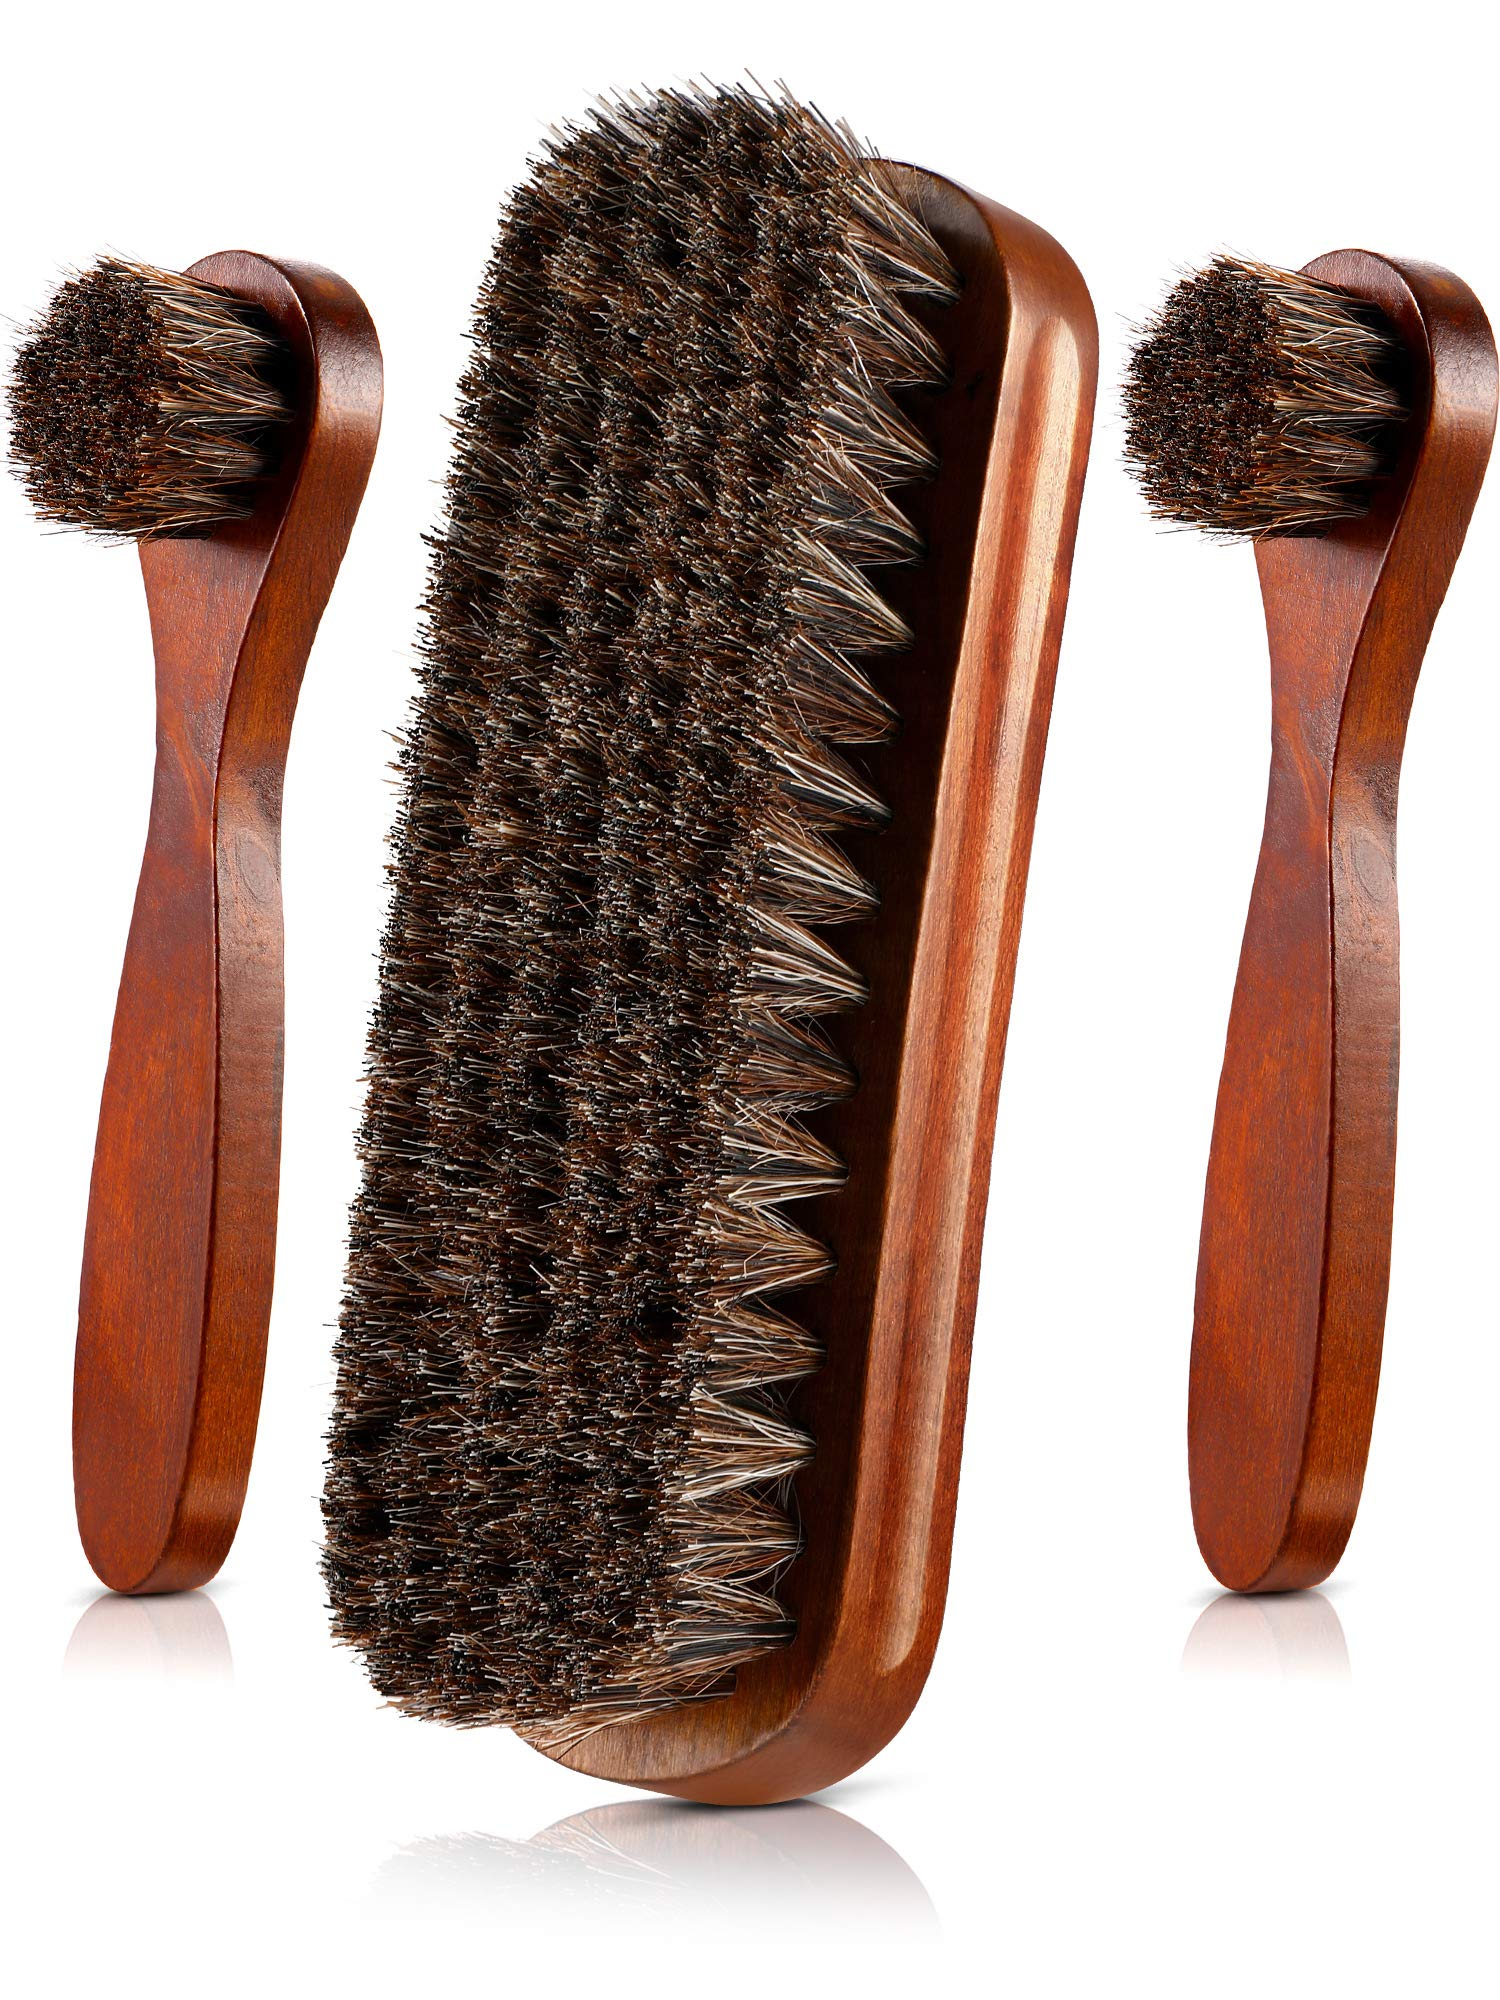 Trolleycar Shoe Polish Brushes Professional Quality Dauber Applicator 2 Pack